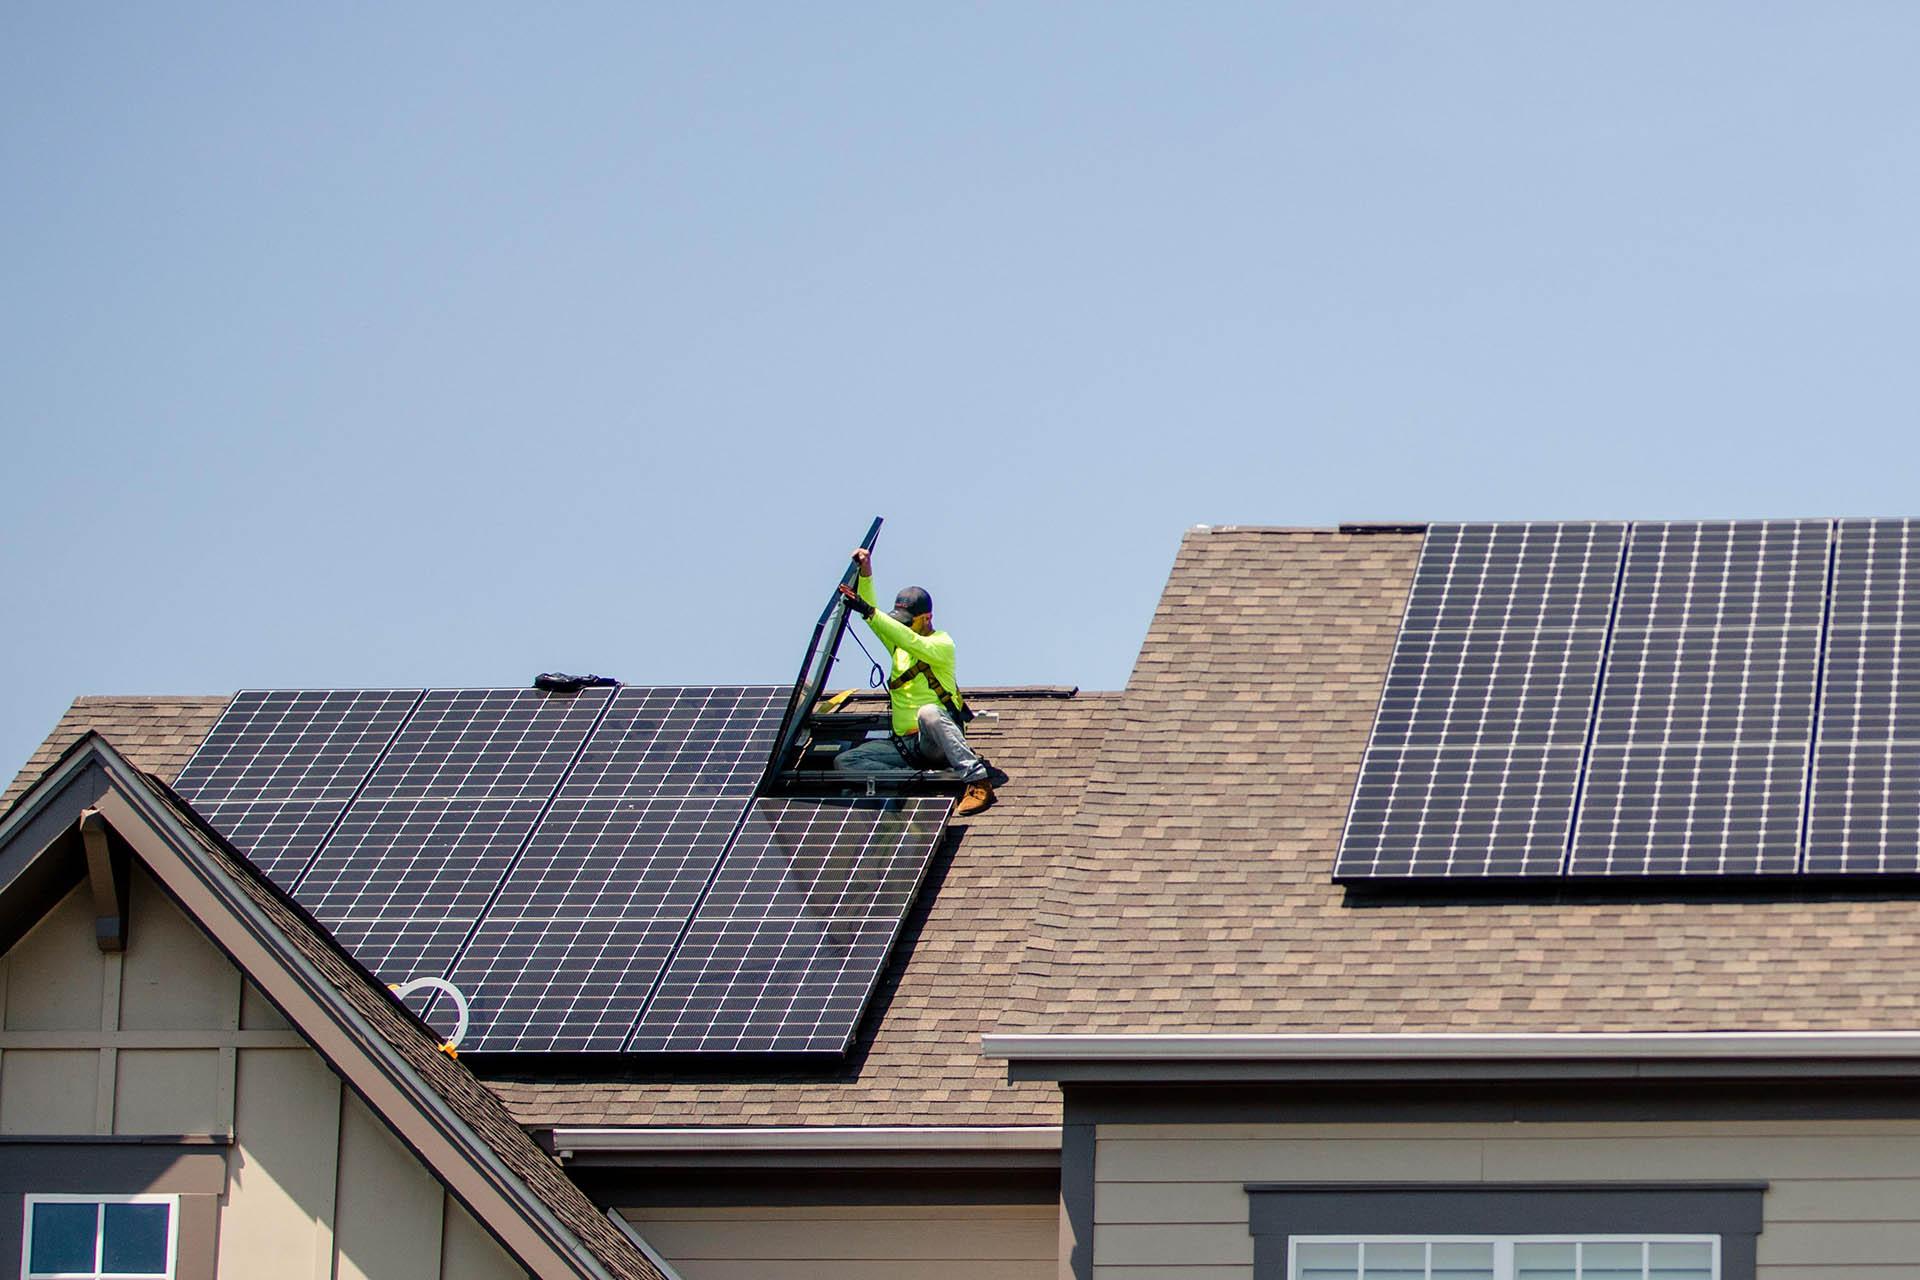 image of solar panel installation by prospect solar